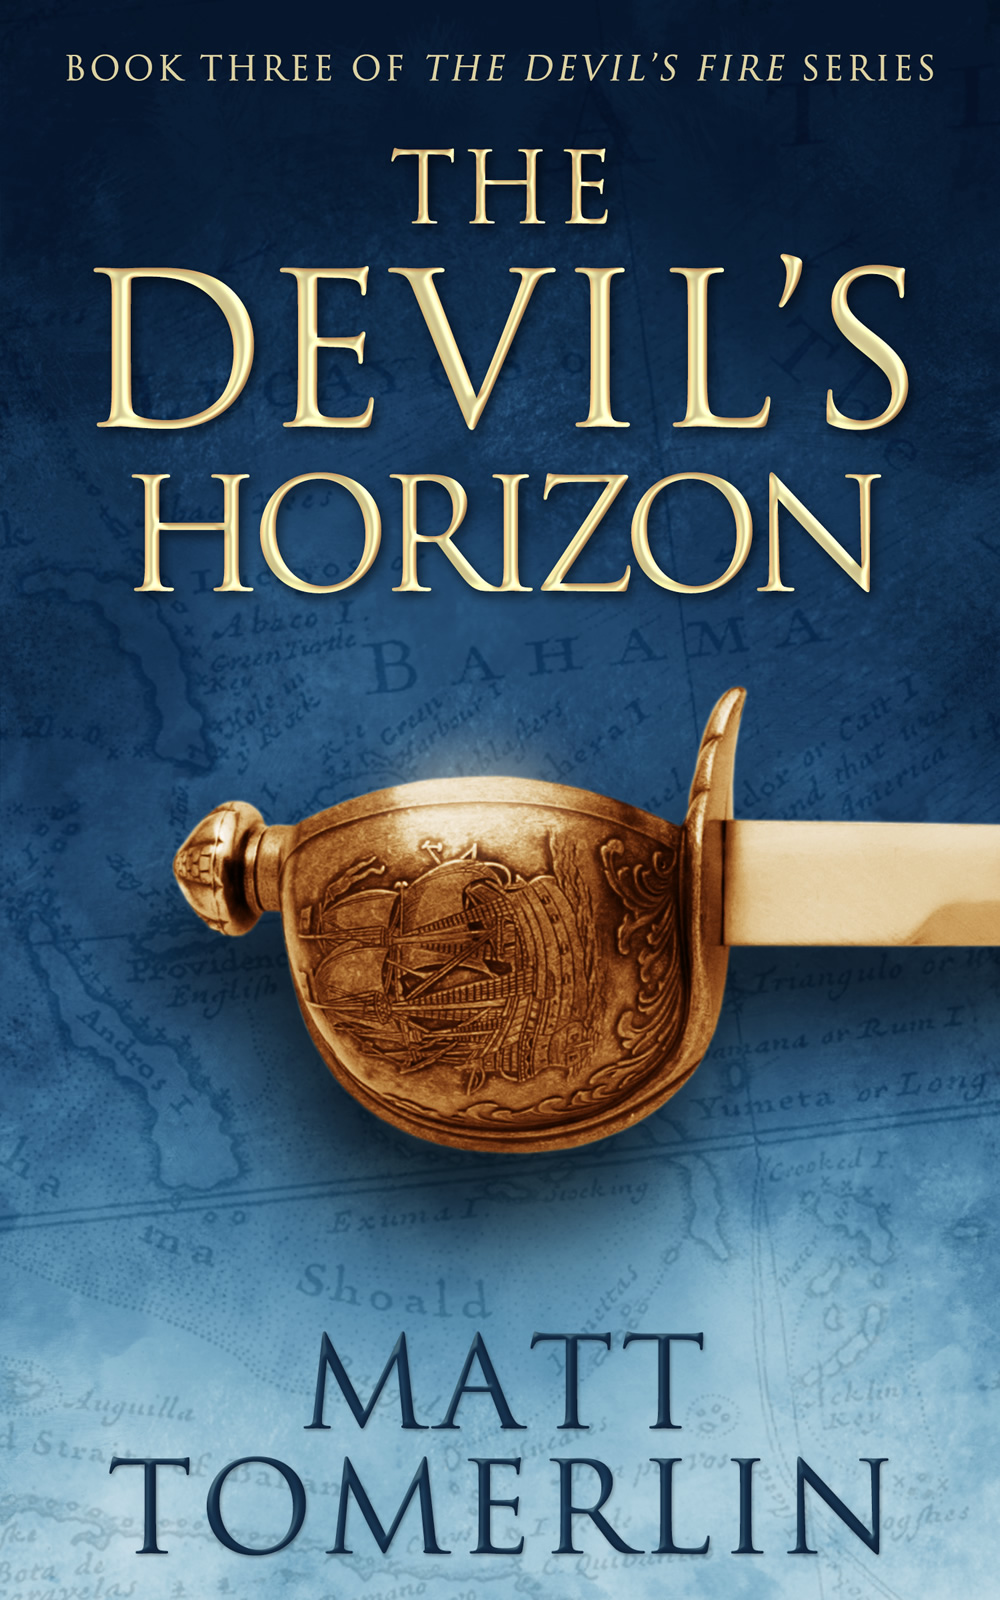 The Devil's Horizon